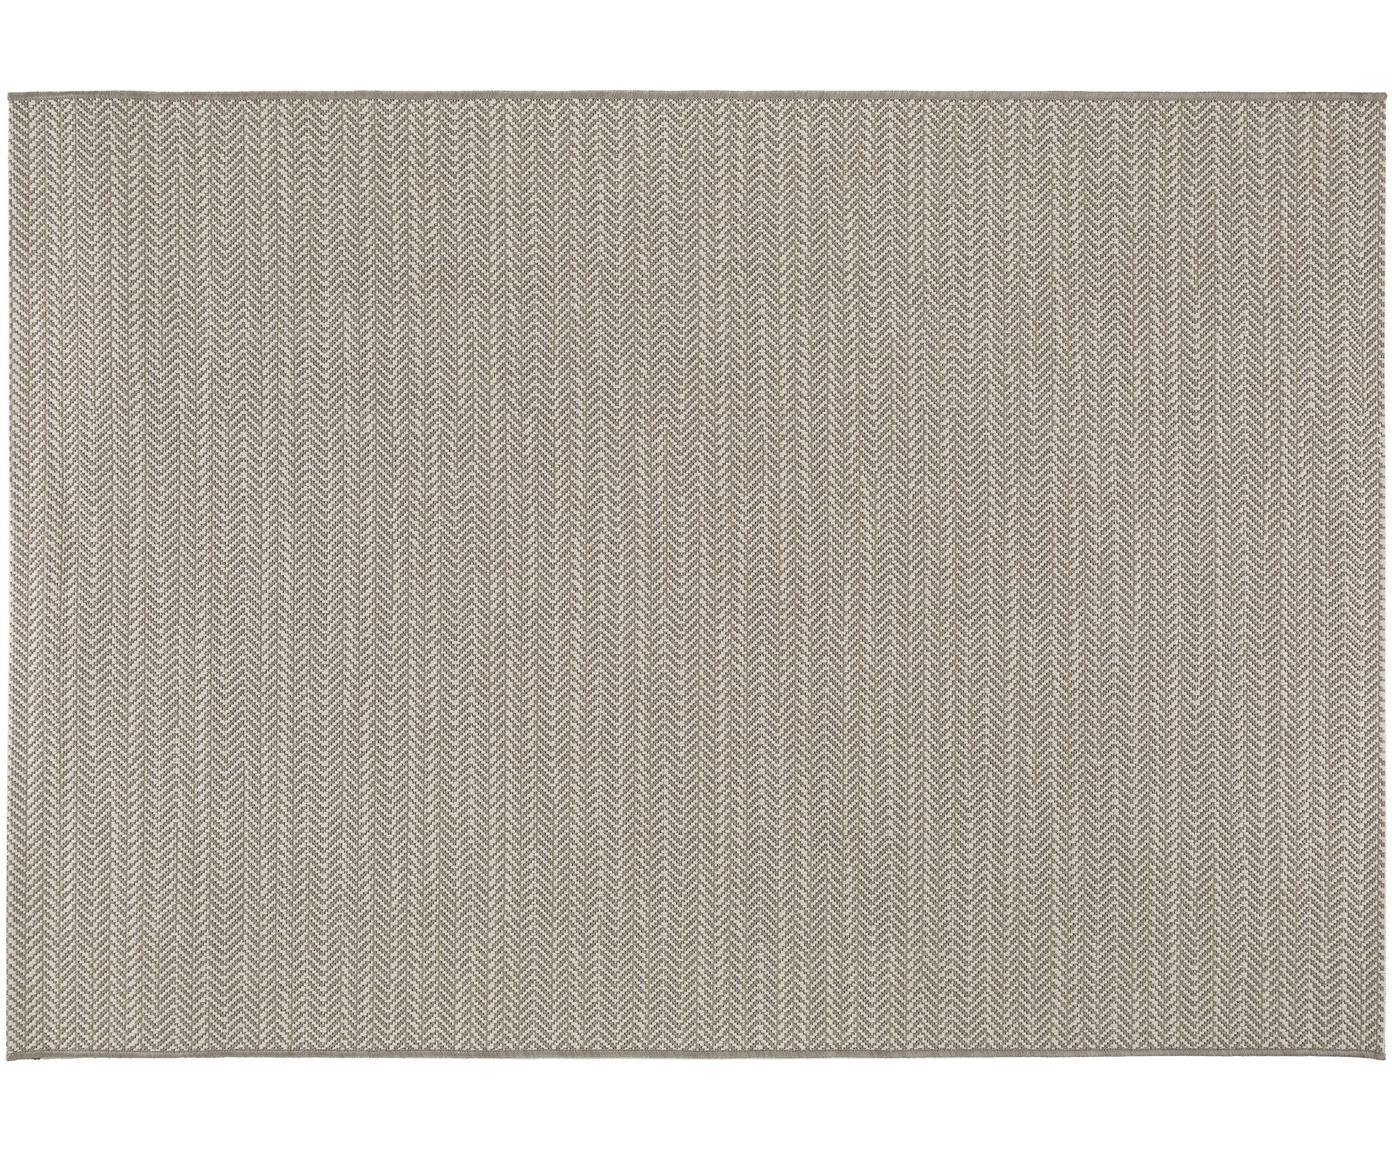 Tappeto da interno-esterno Metro Needle, Polipropilene, Beige, Larg. 80 x Lung. 150 cm (taglia XS)